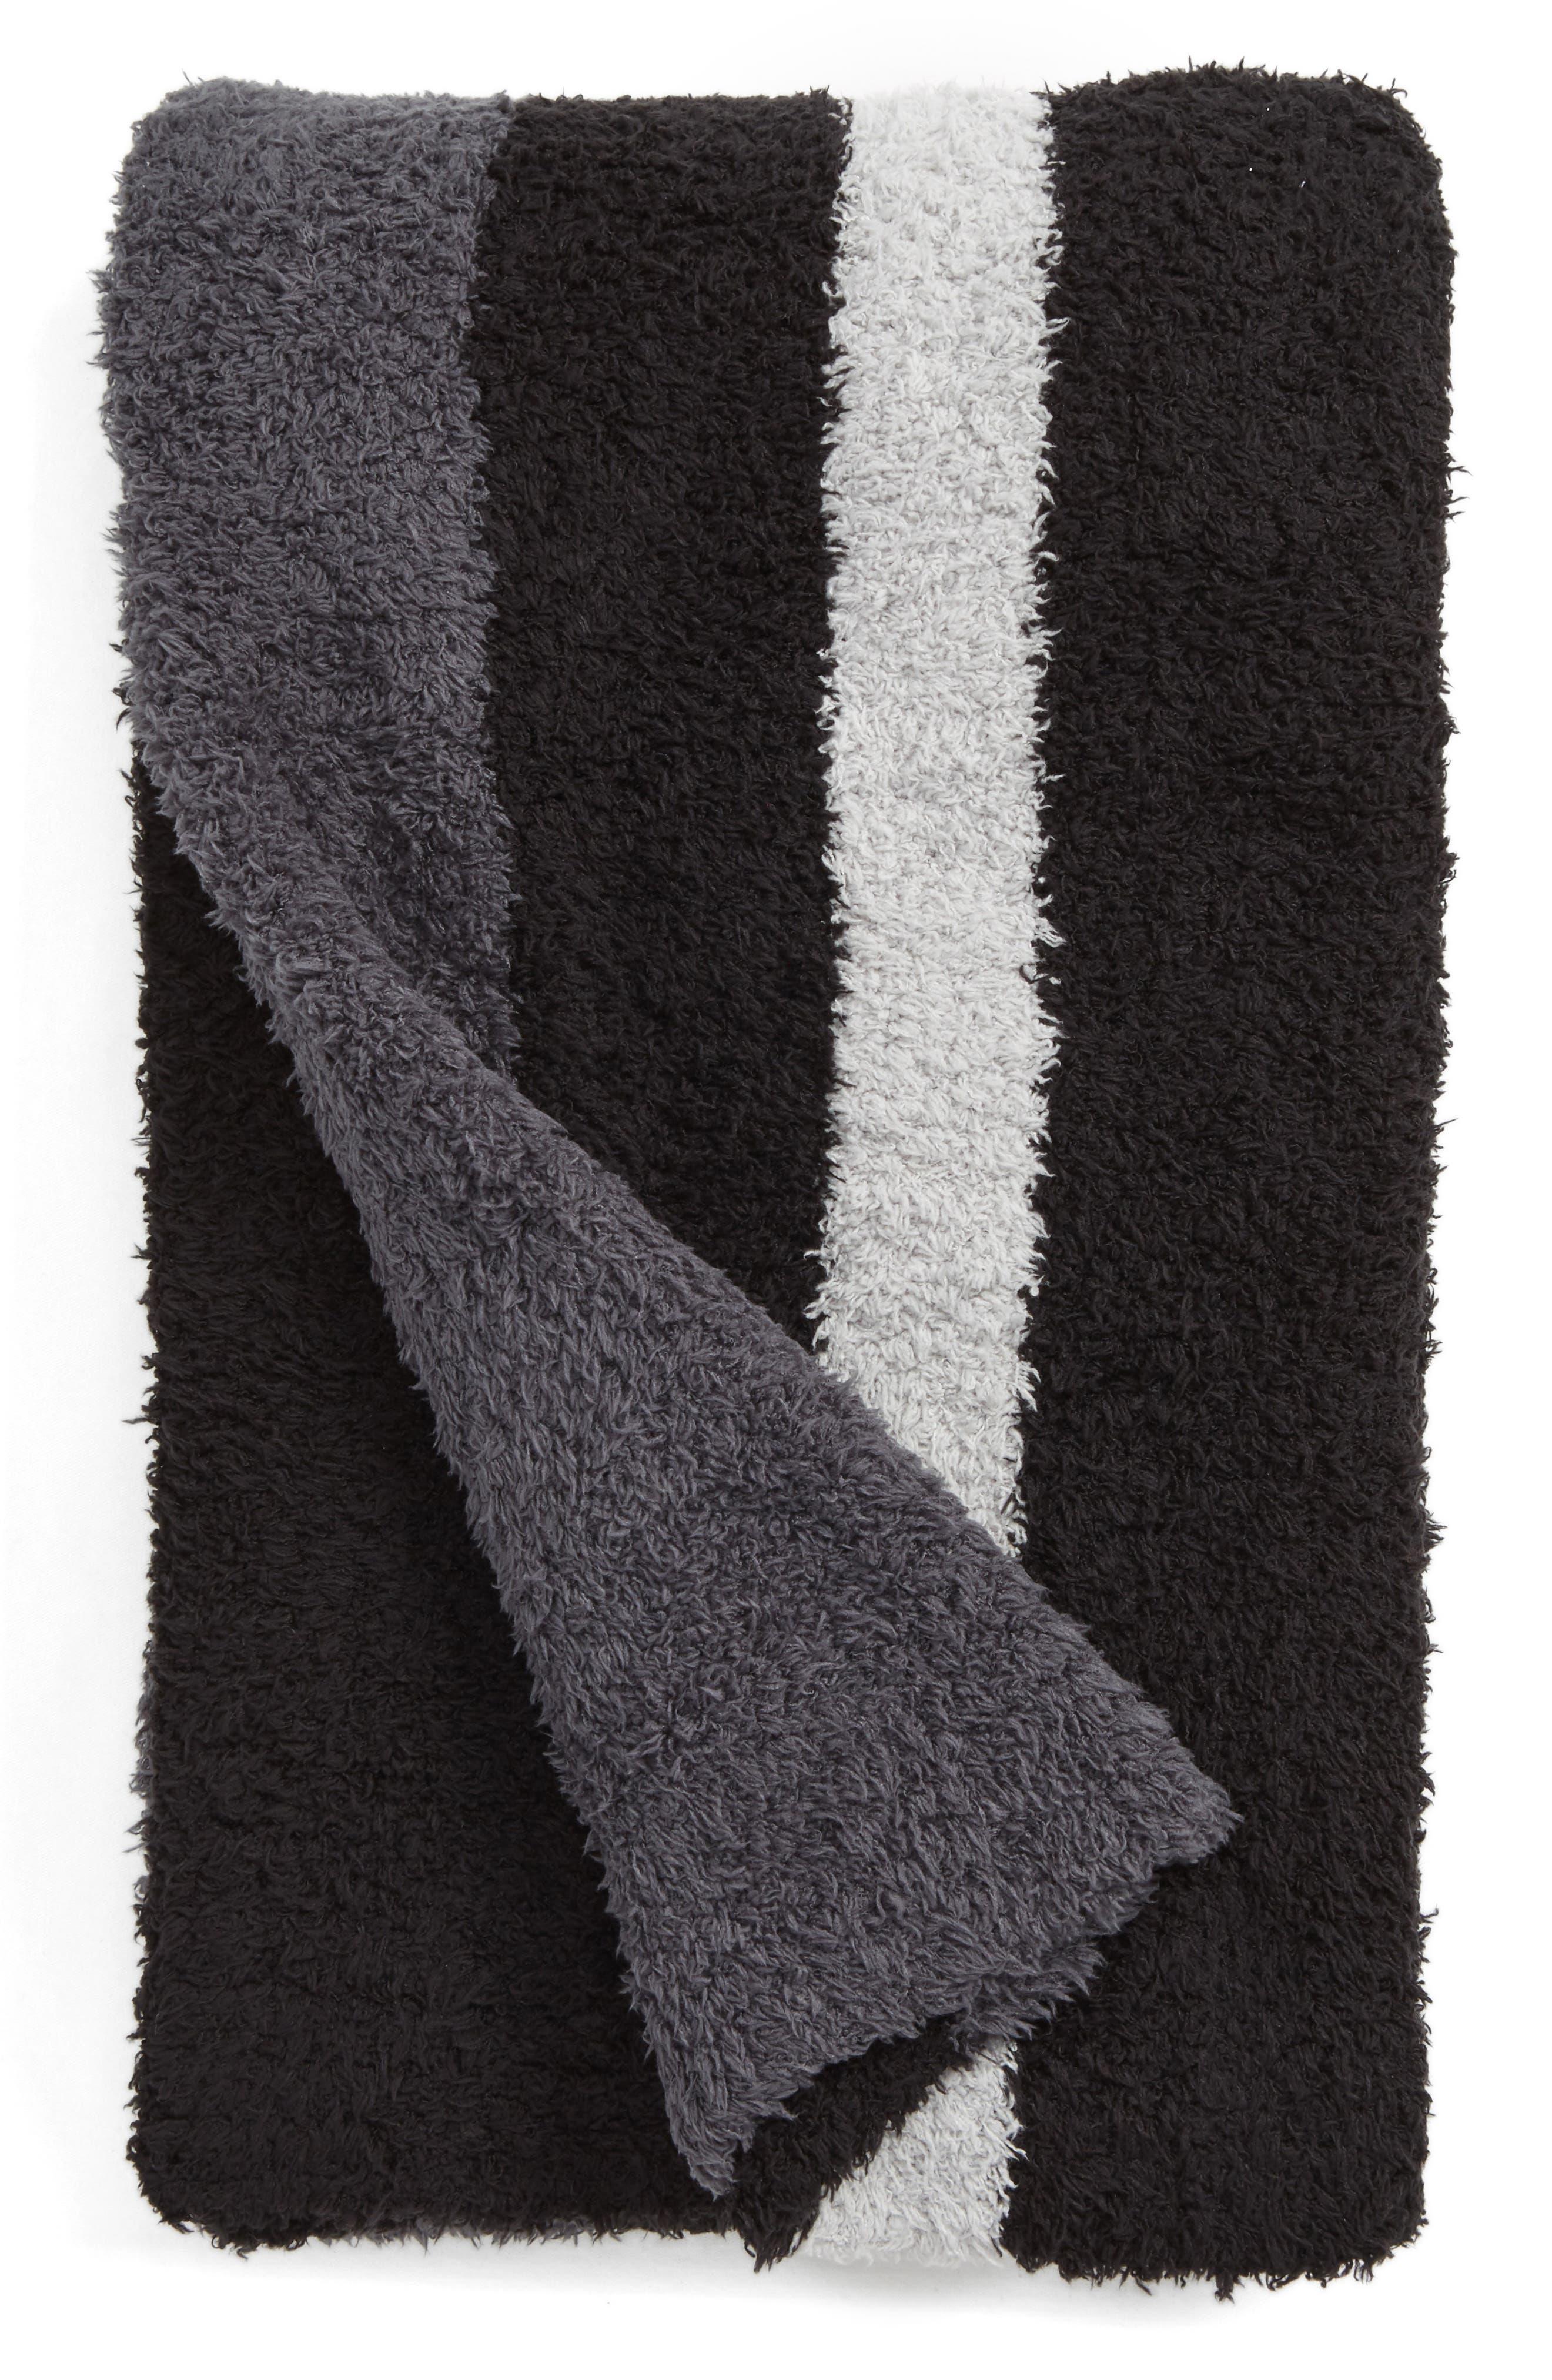 Alternate Image 1 Selected - Barefoot Dreams® Cozychic® Block Stripe Throw Blanket